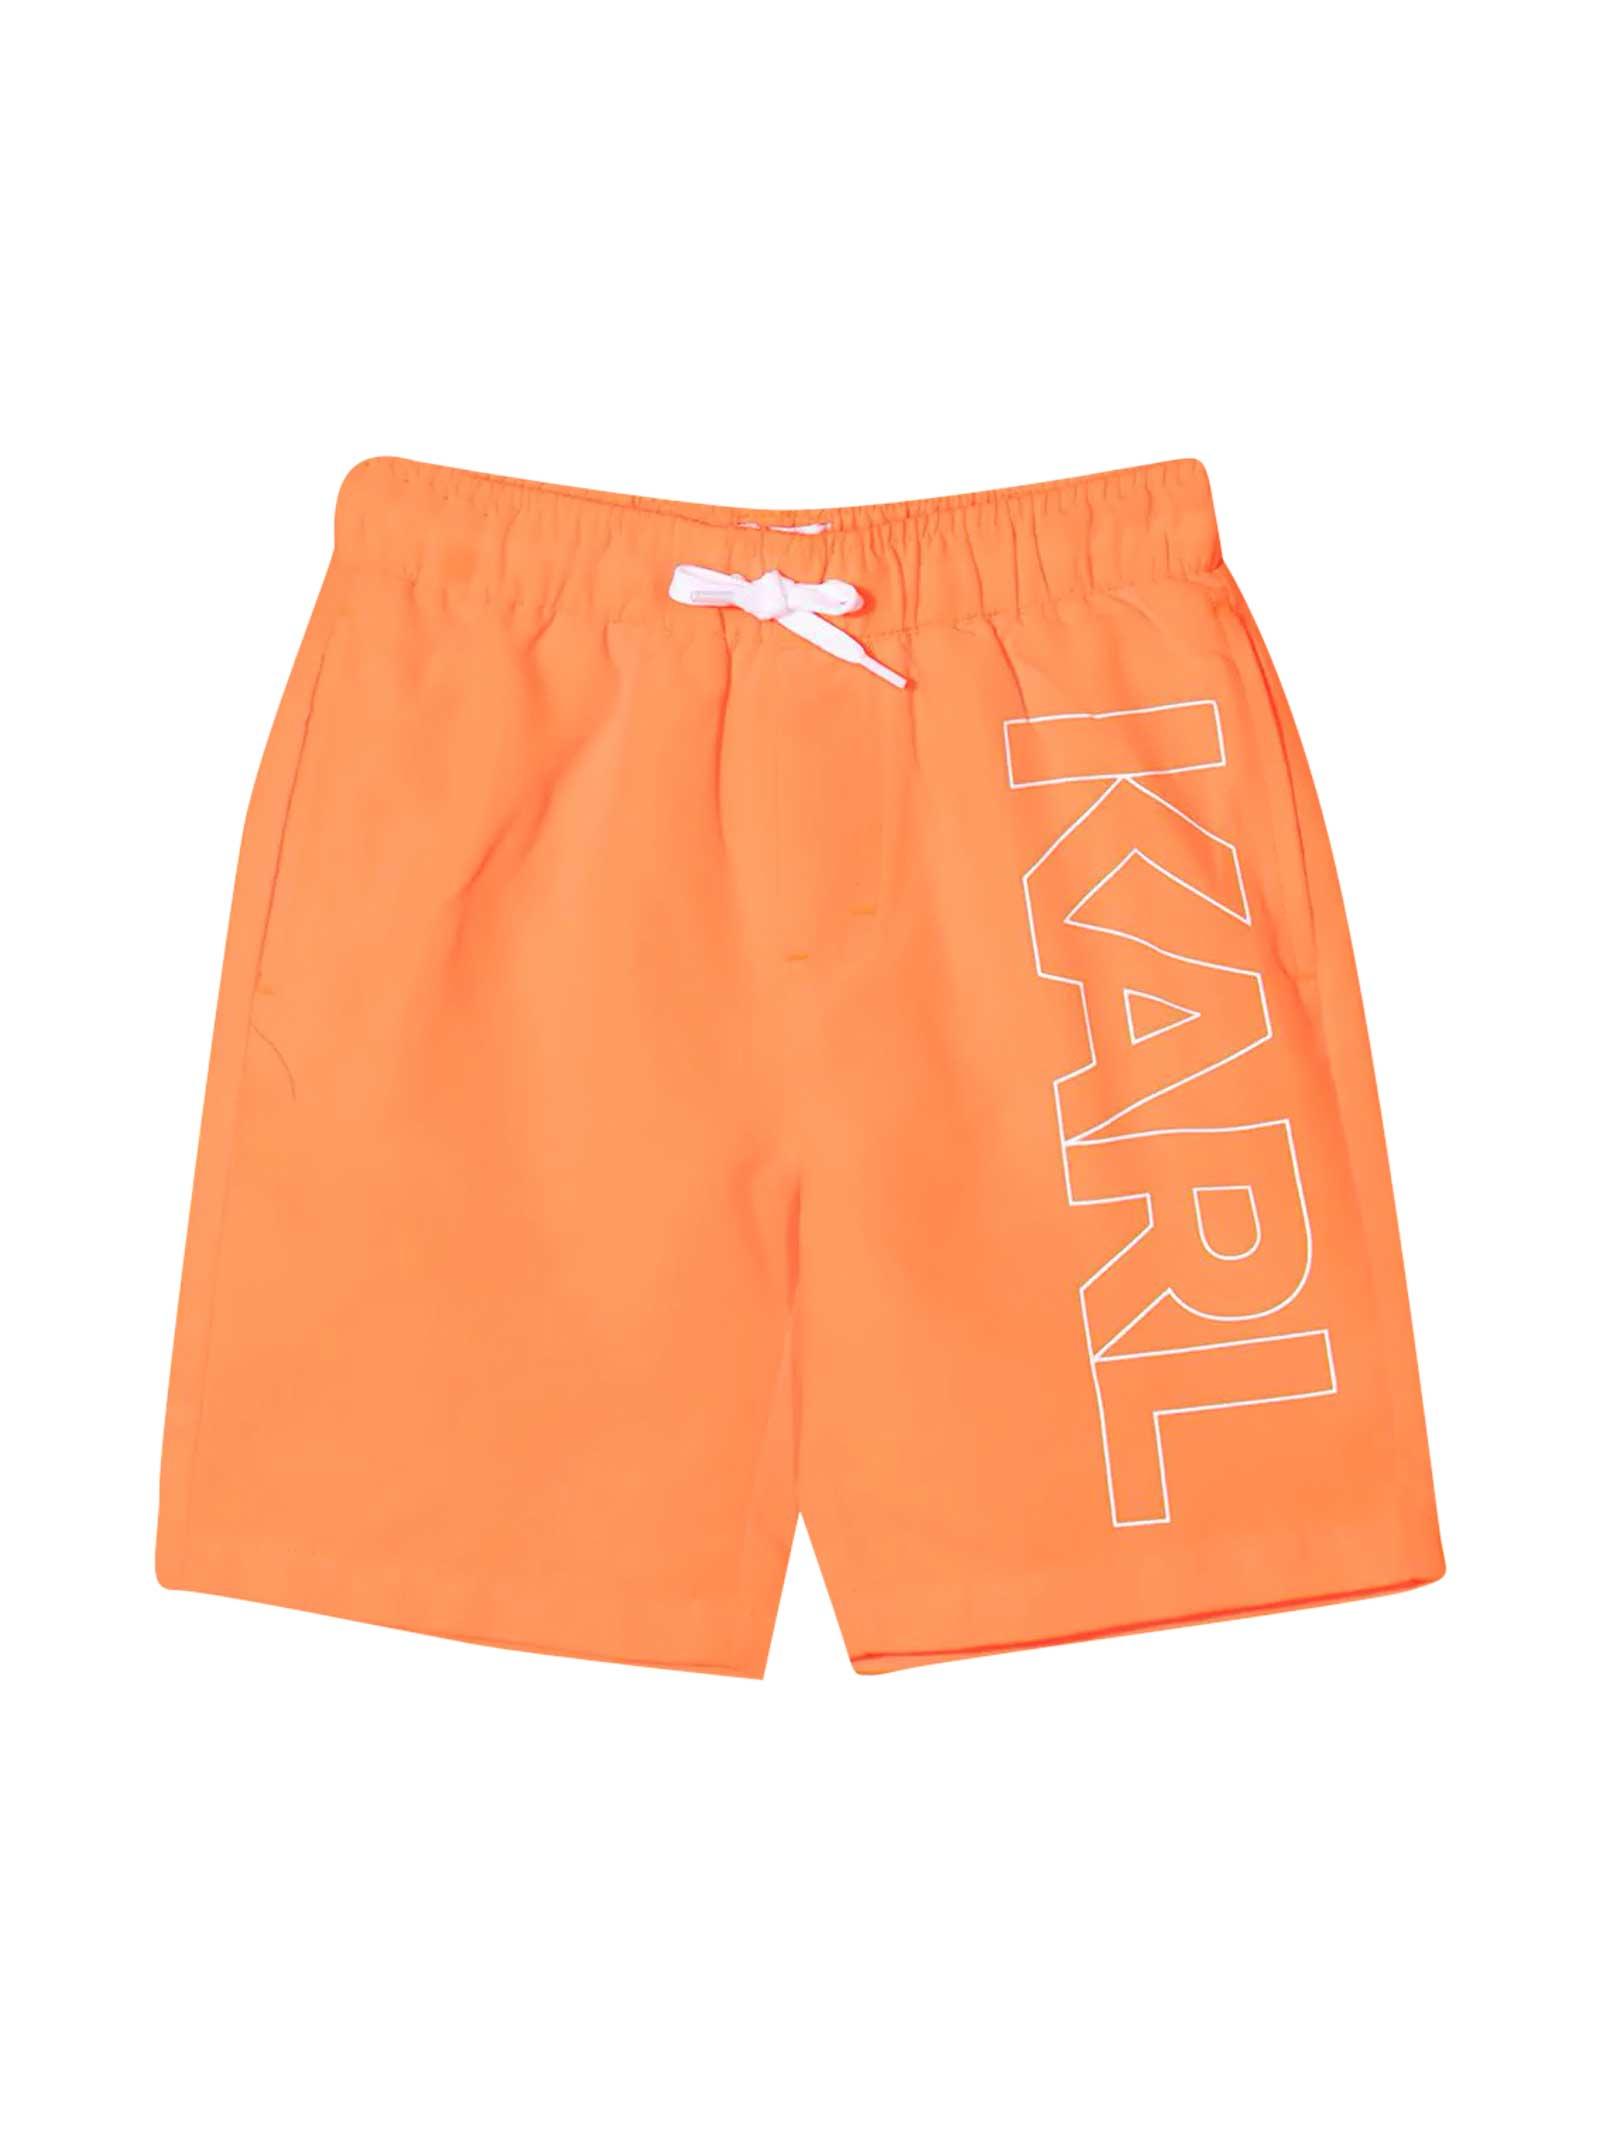 Teen Swim Shorts With Print